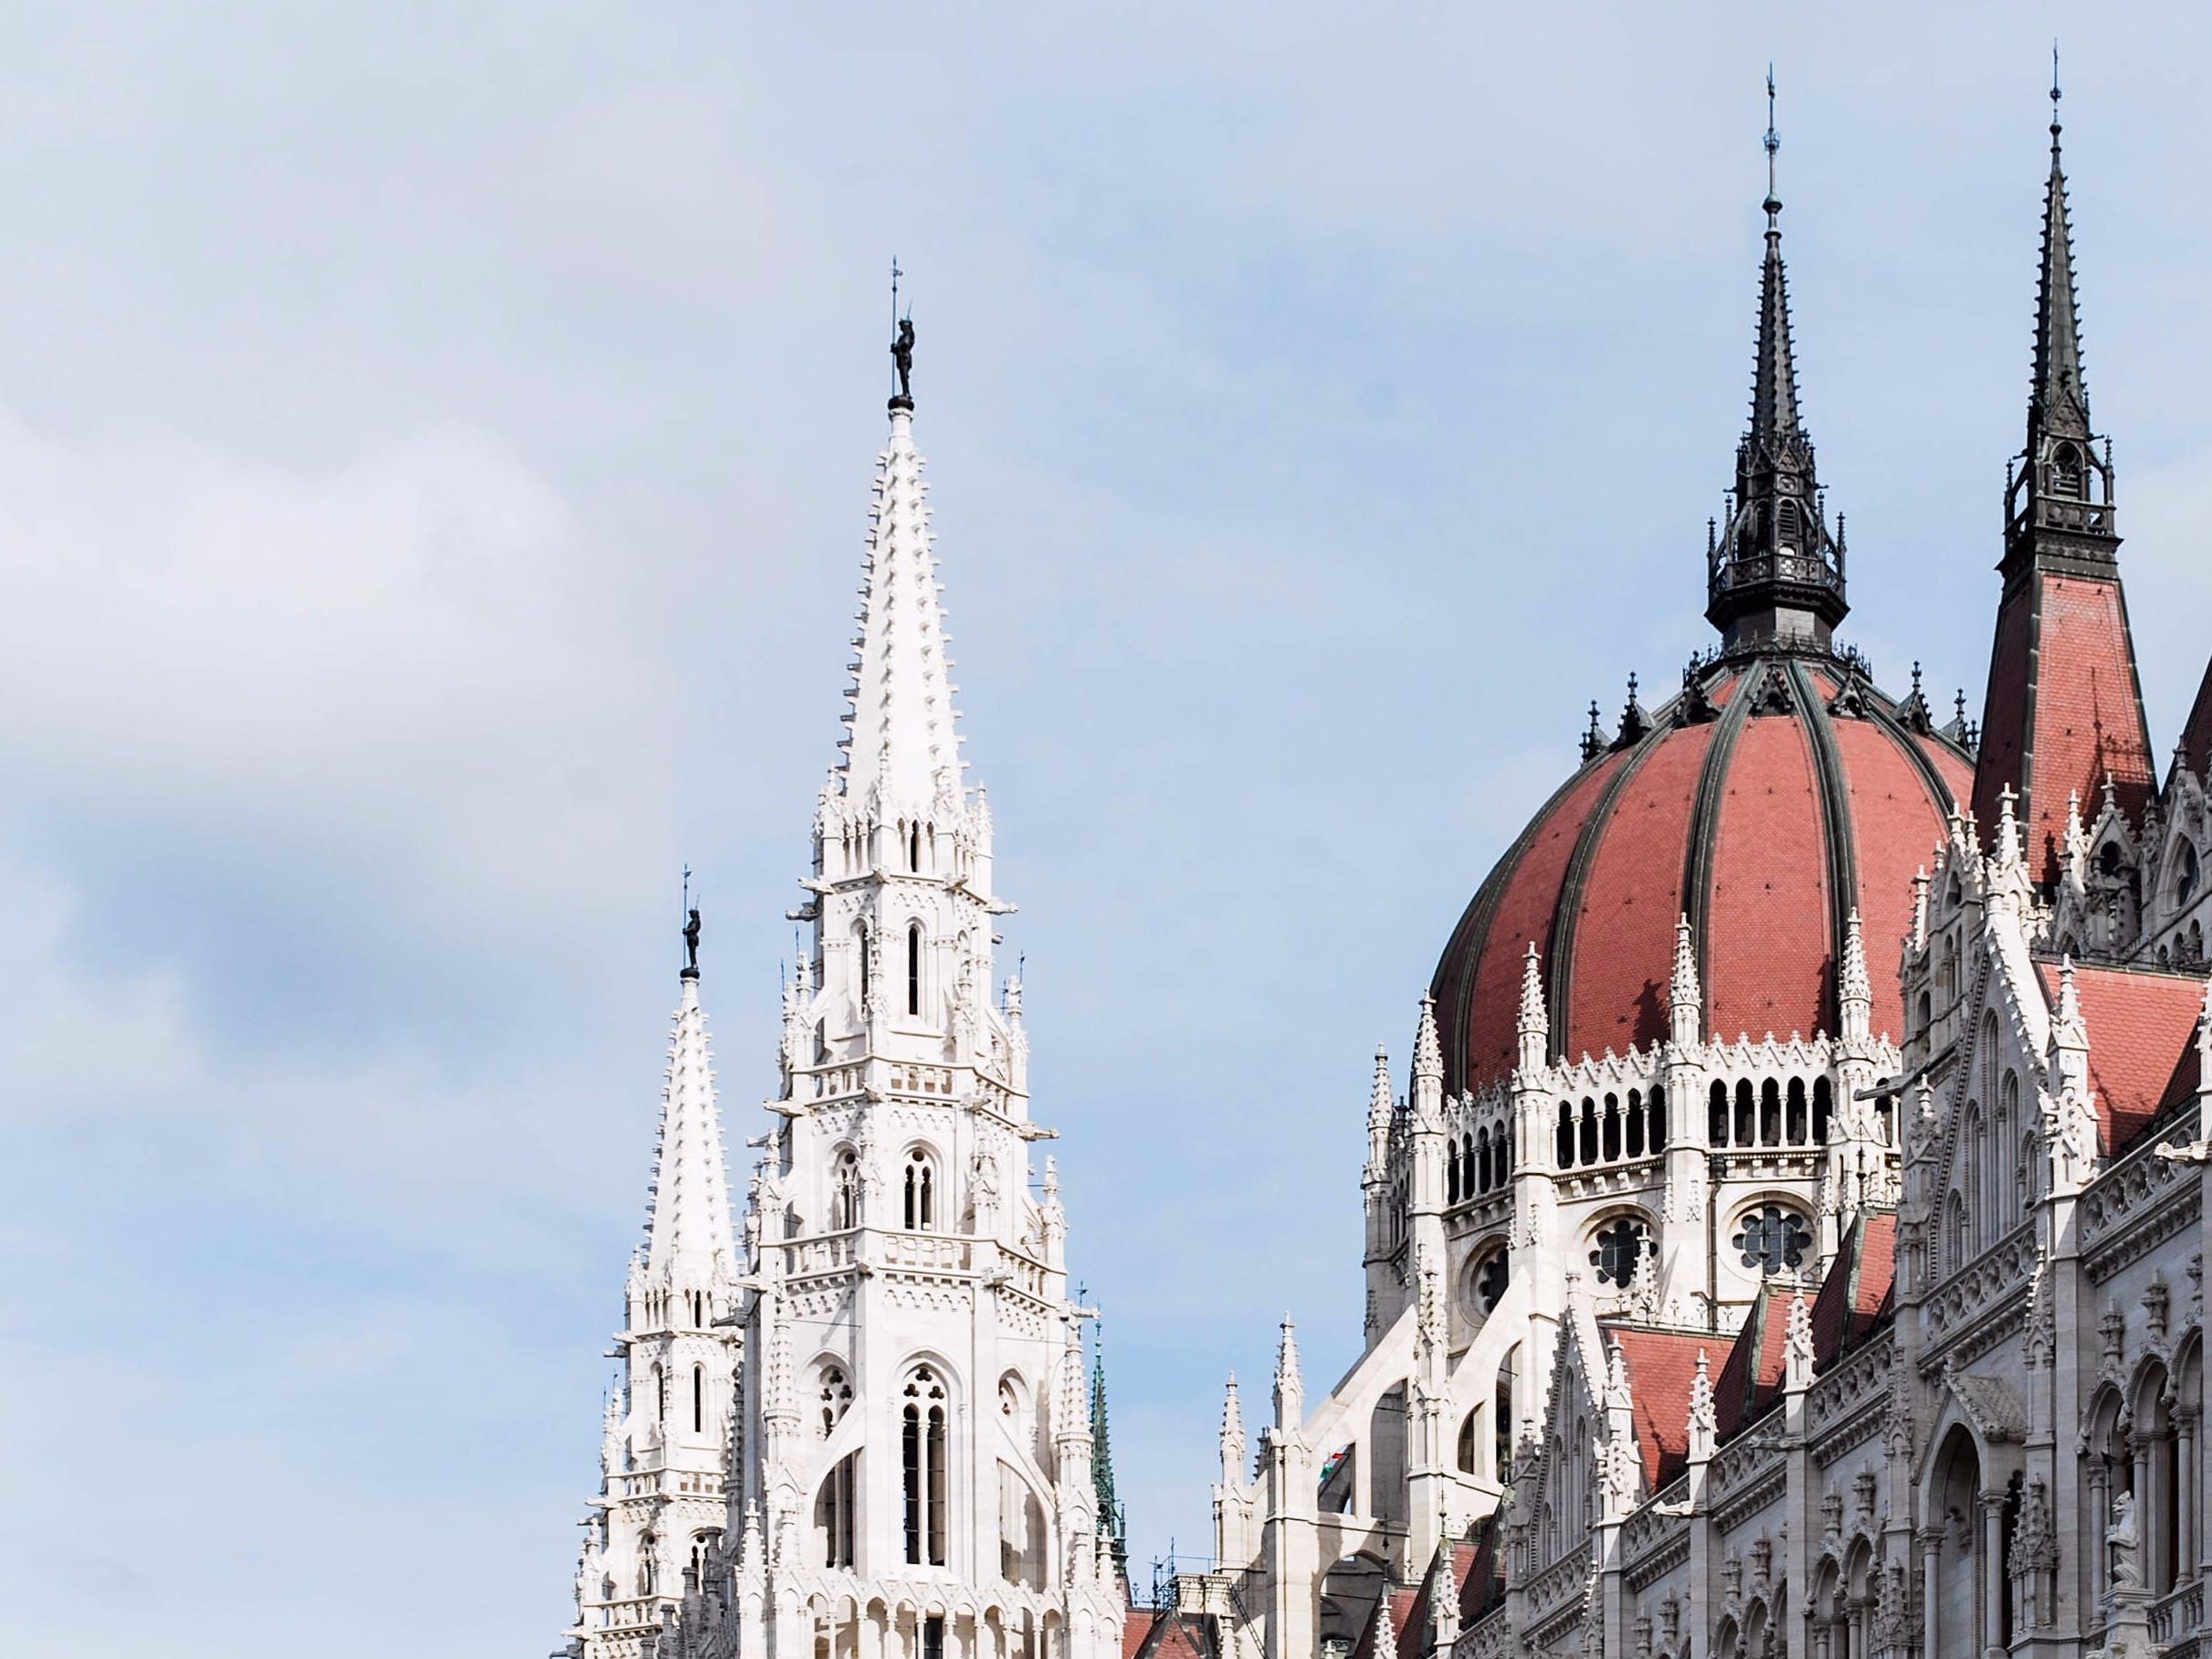 10.Budapest, the Pearl of the Danube. Emedemoca